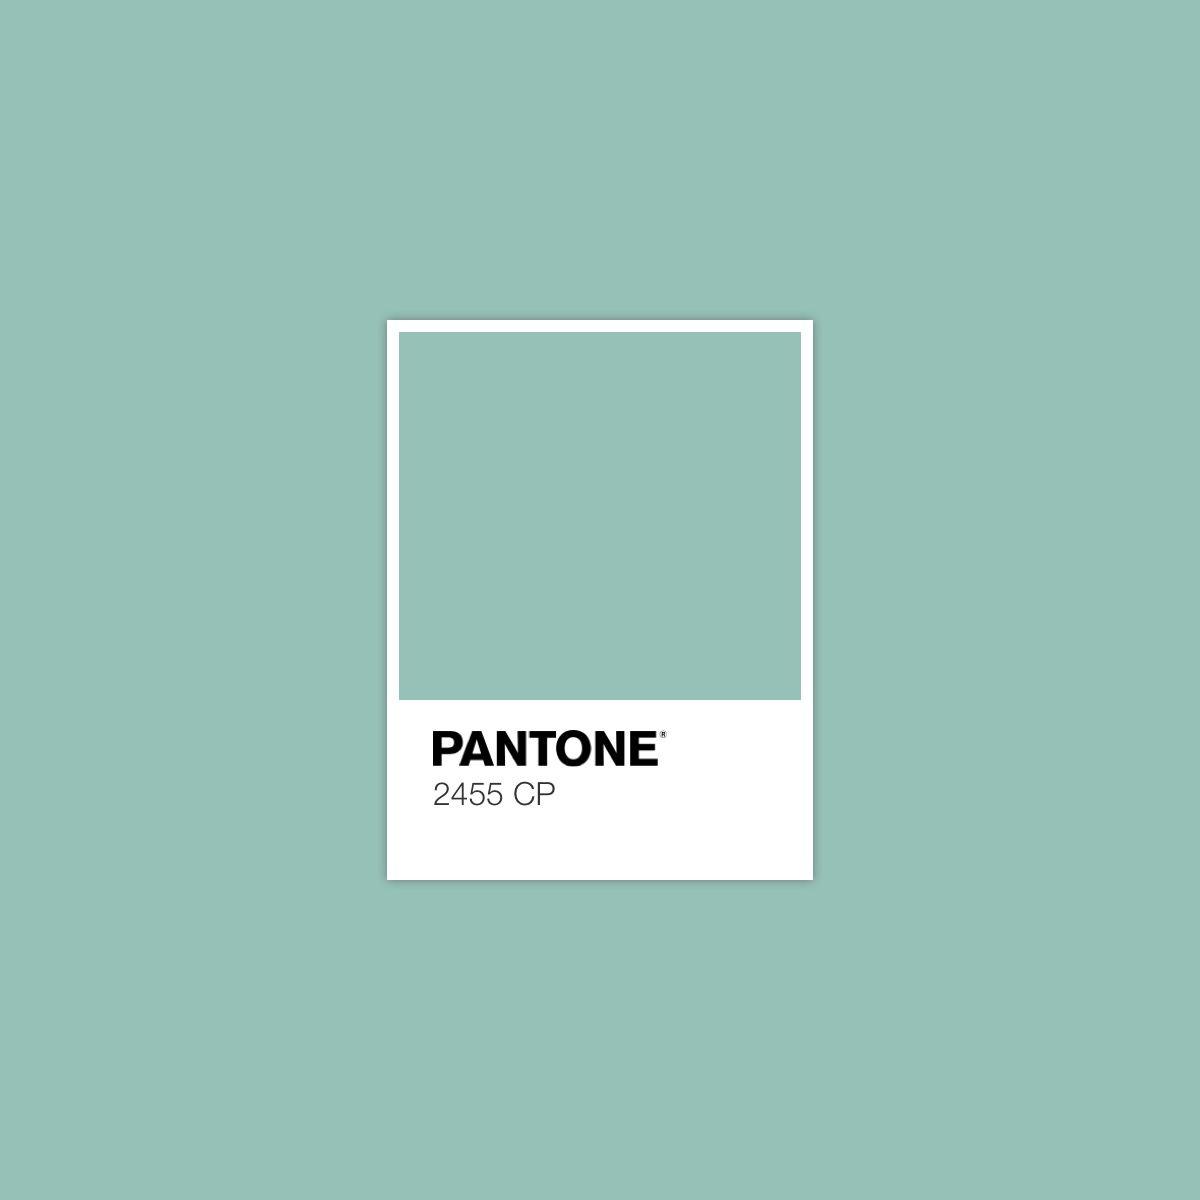 primary color pantone brand palette colors spring summer 2020 cool grey 2u